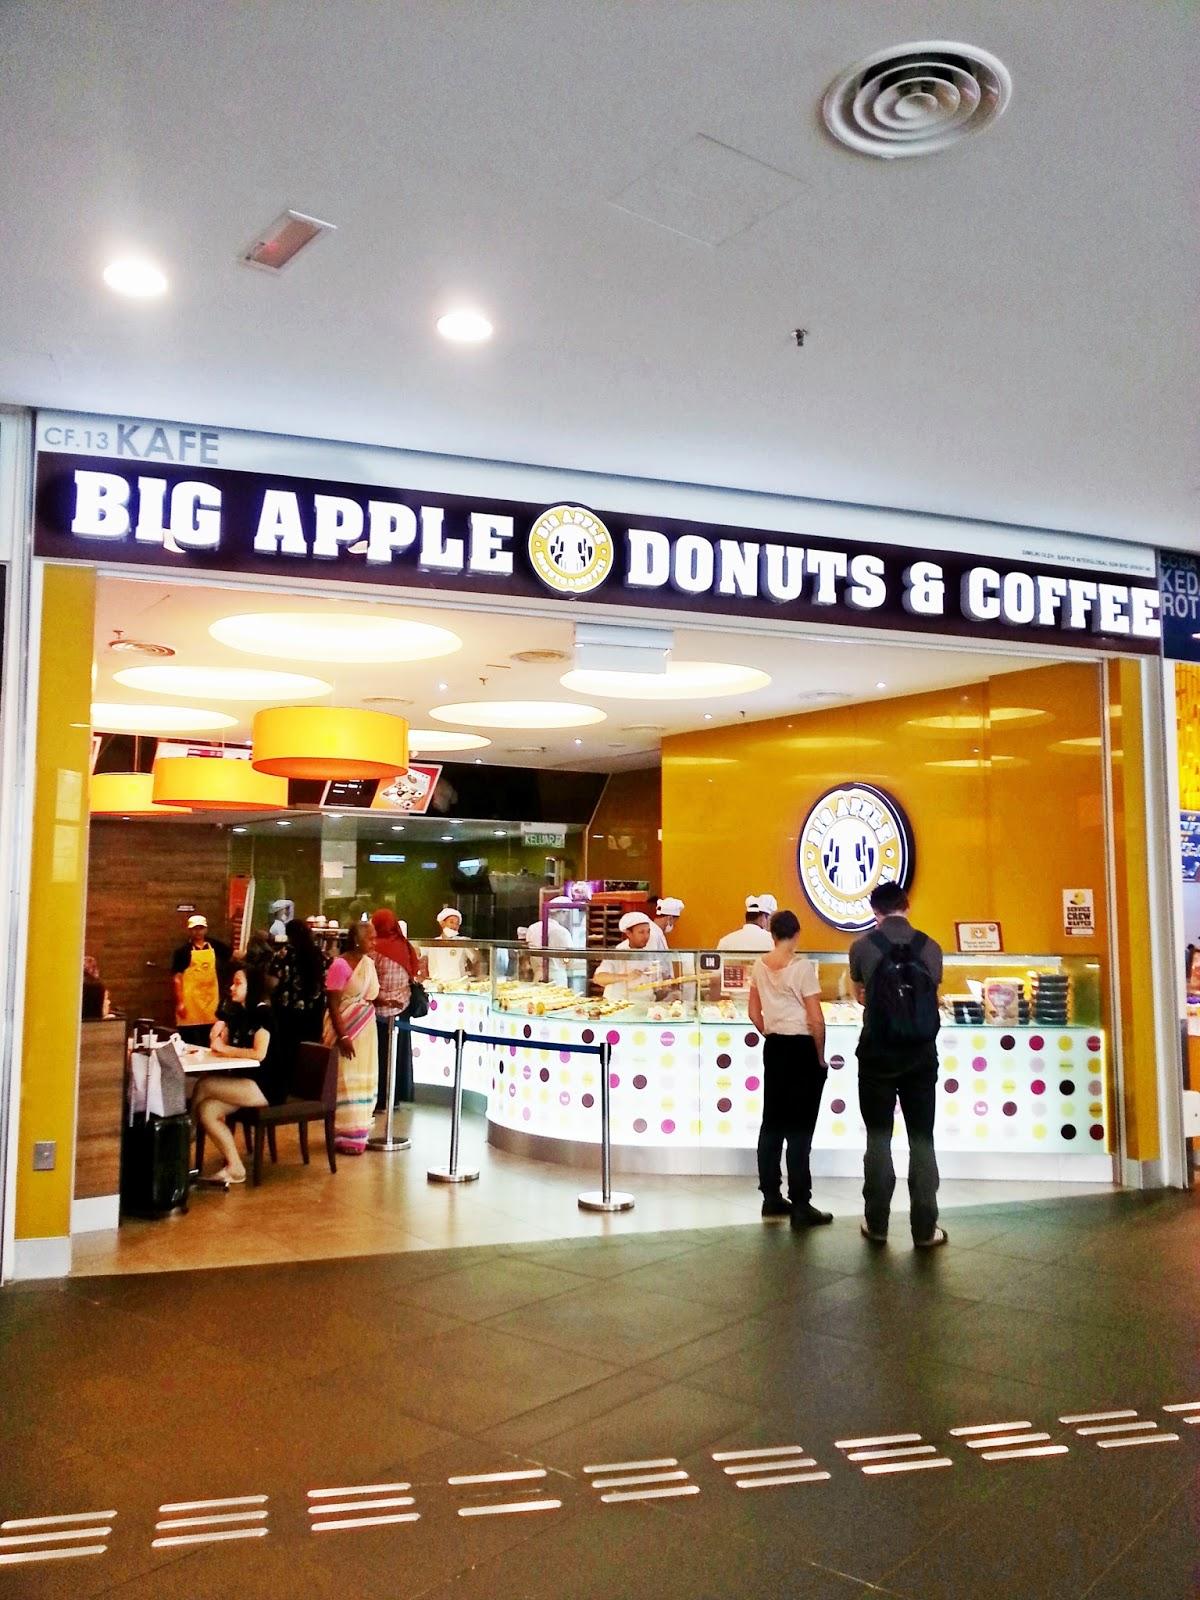 Big apple donut coffee